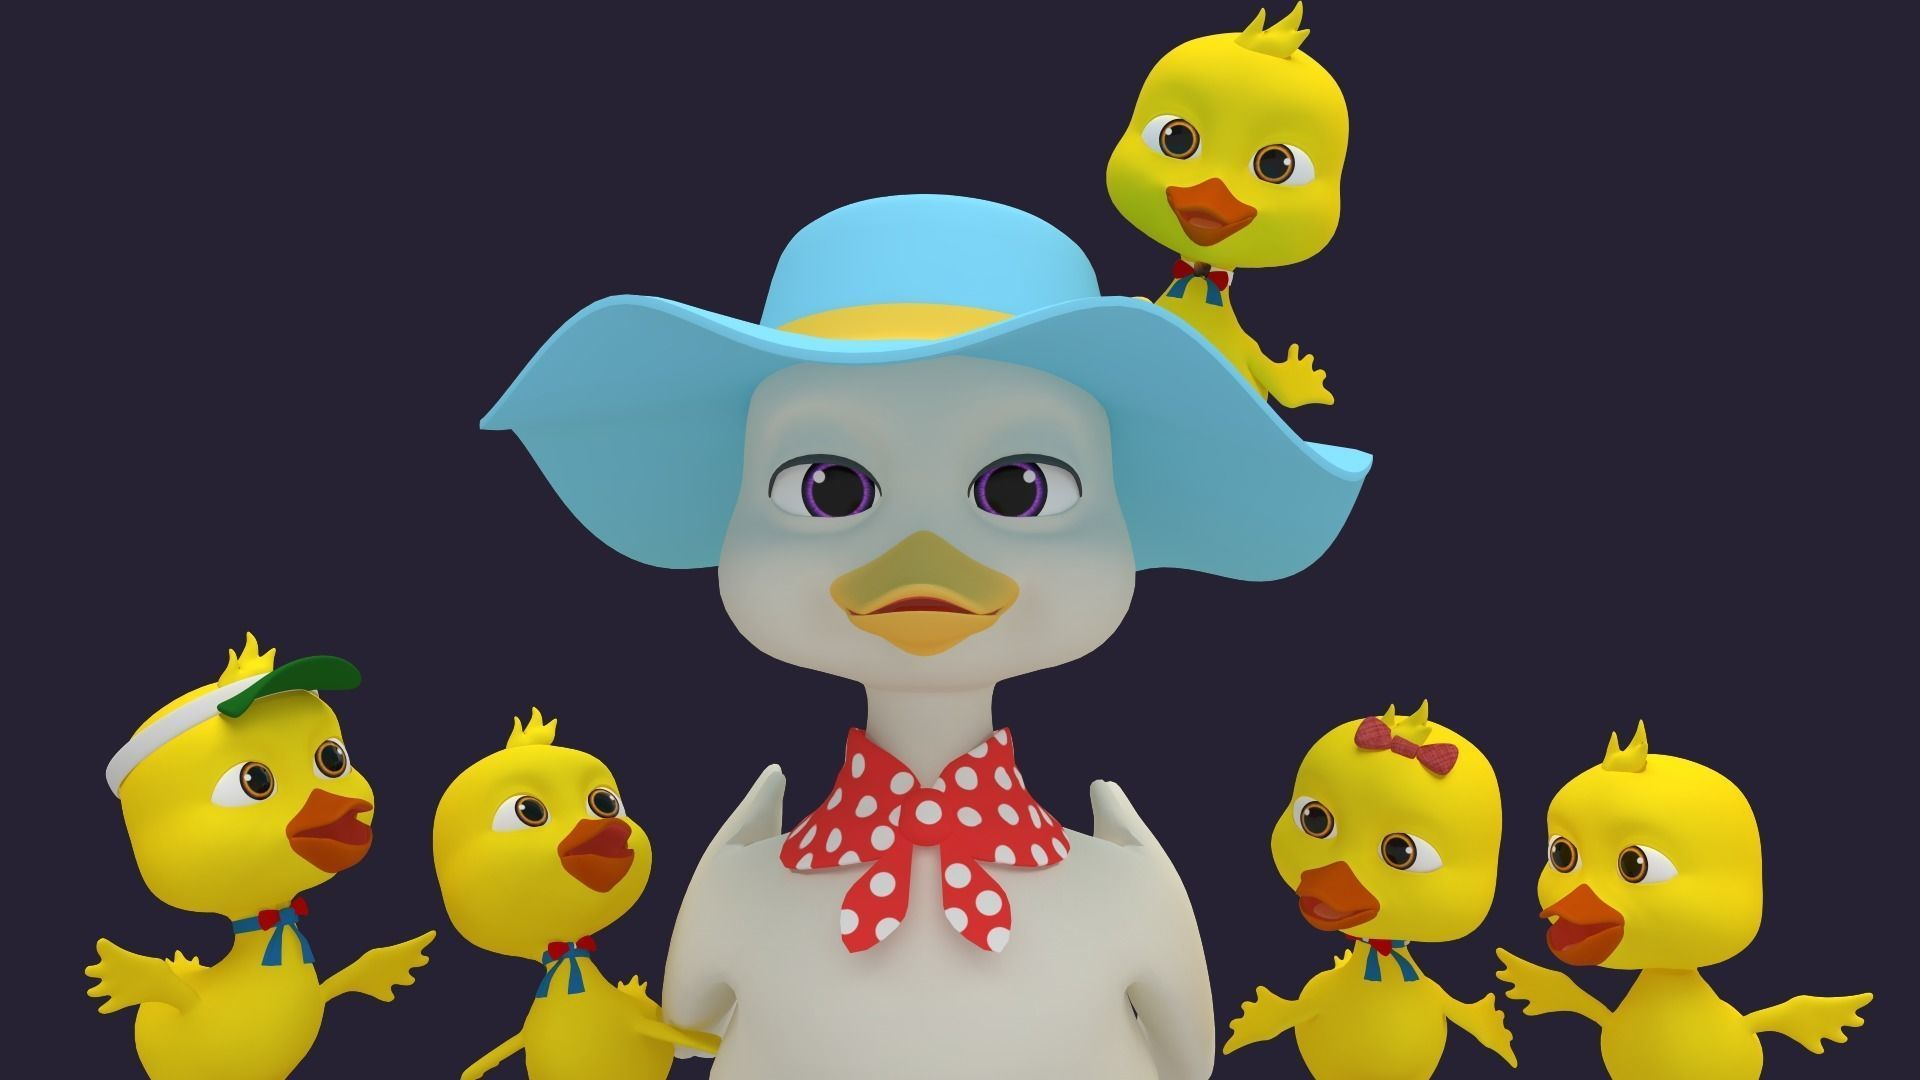 Asset - Cartoons - Character - Duck - Hight Poly